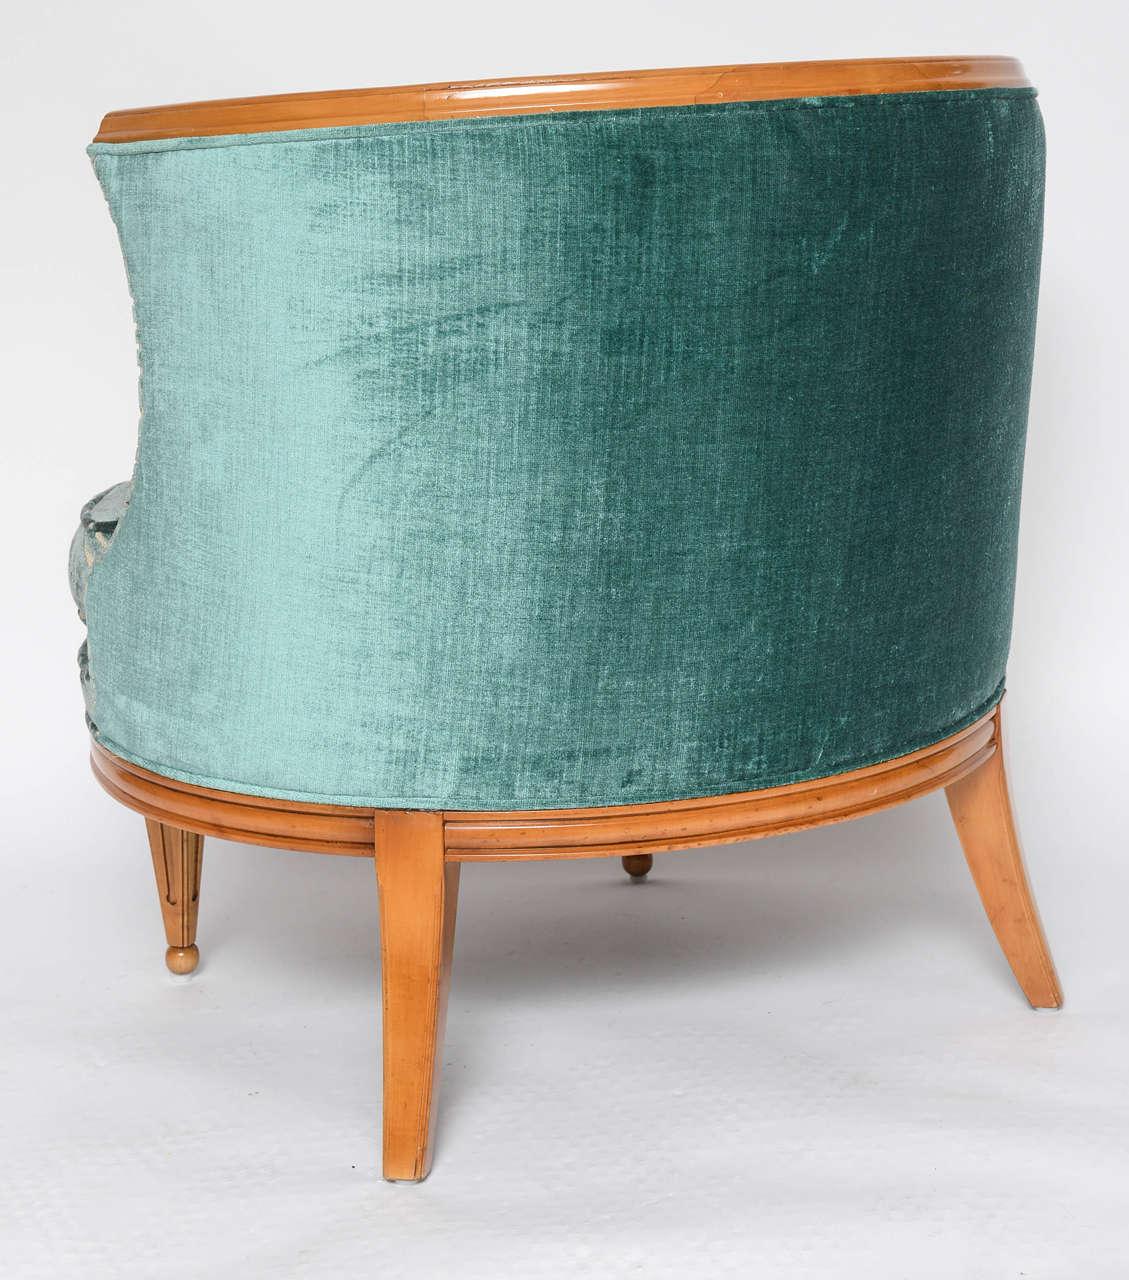 Grosfeld House, 1940s Glamorous Curved Slipper Chair For Sale 1